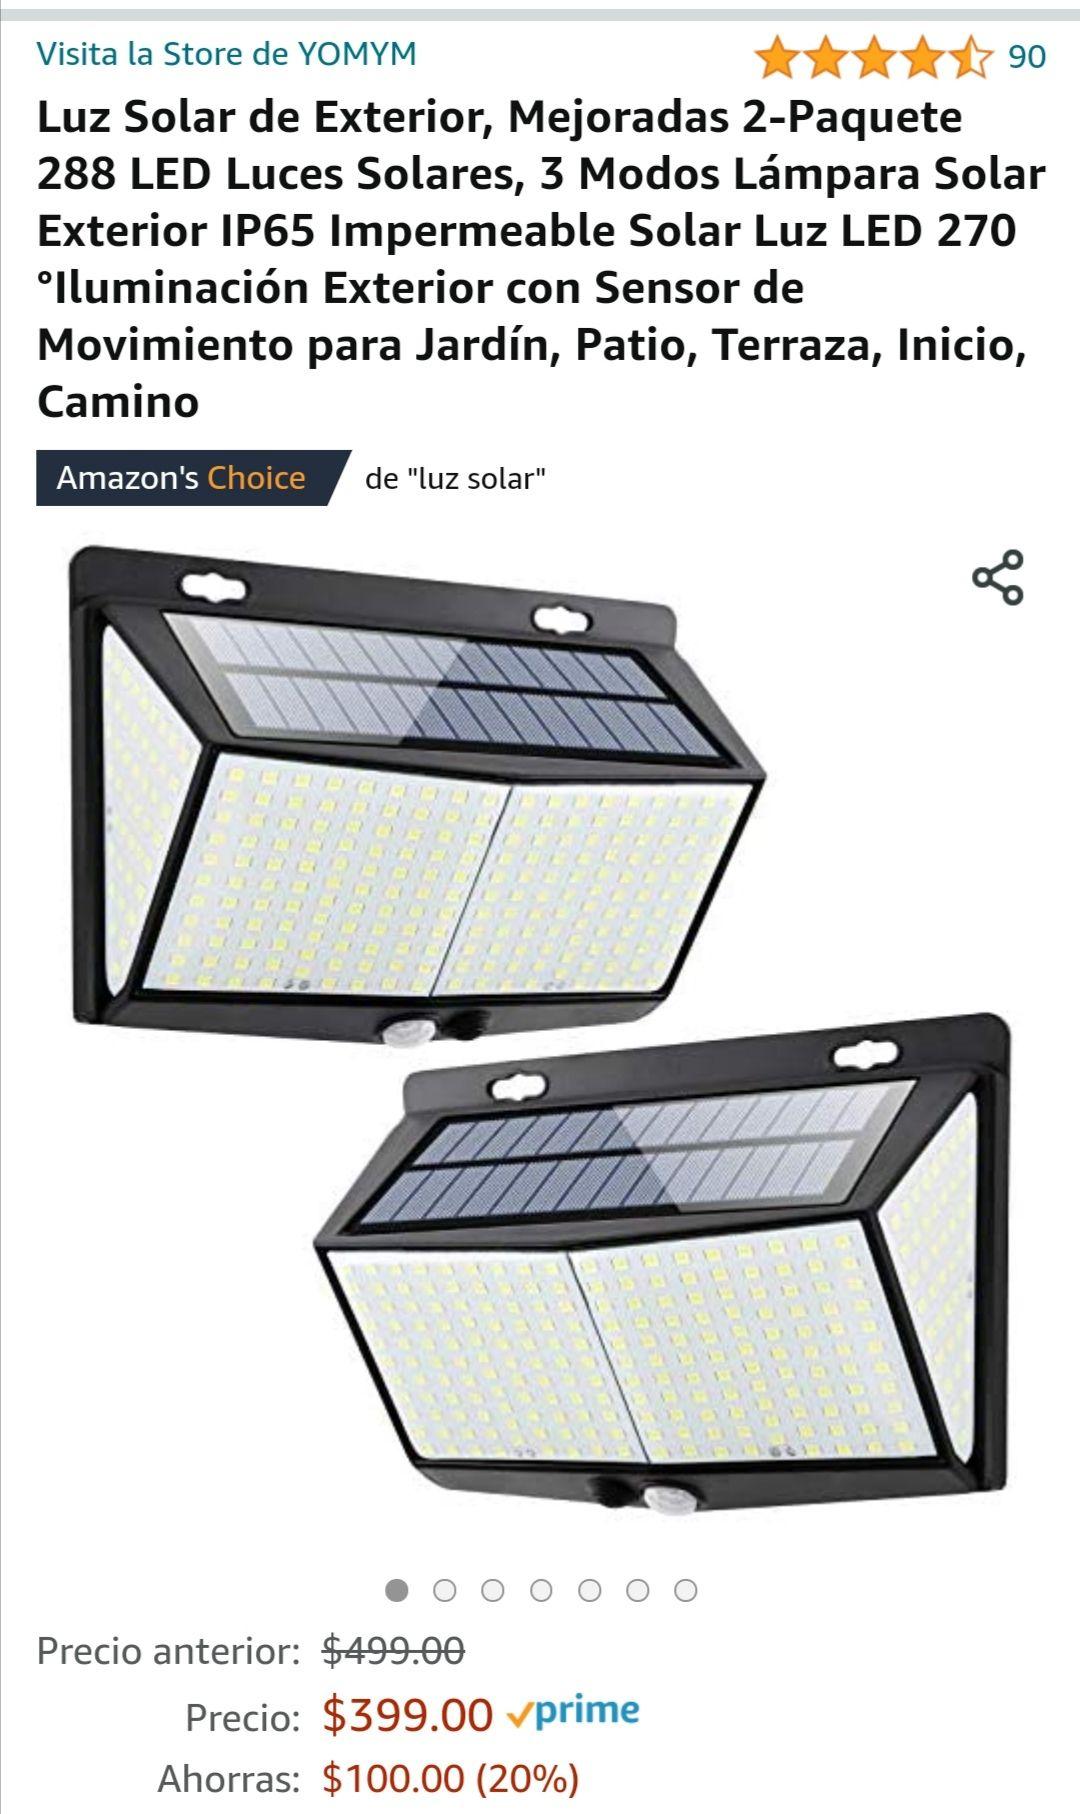 Amazon Luz Solar de Exterior, Mejoradas 2-Paquete 288 LED